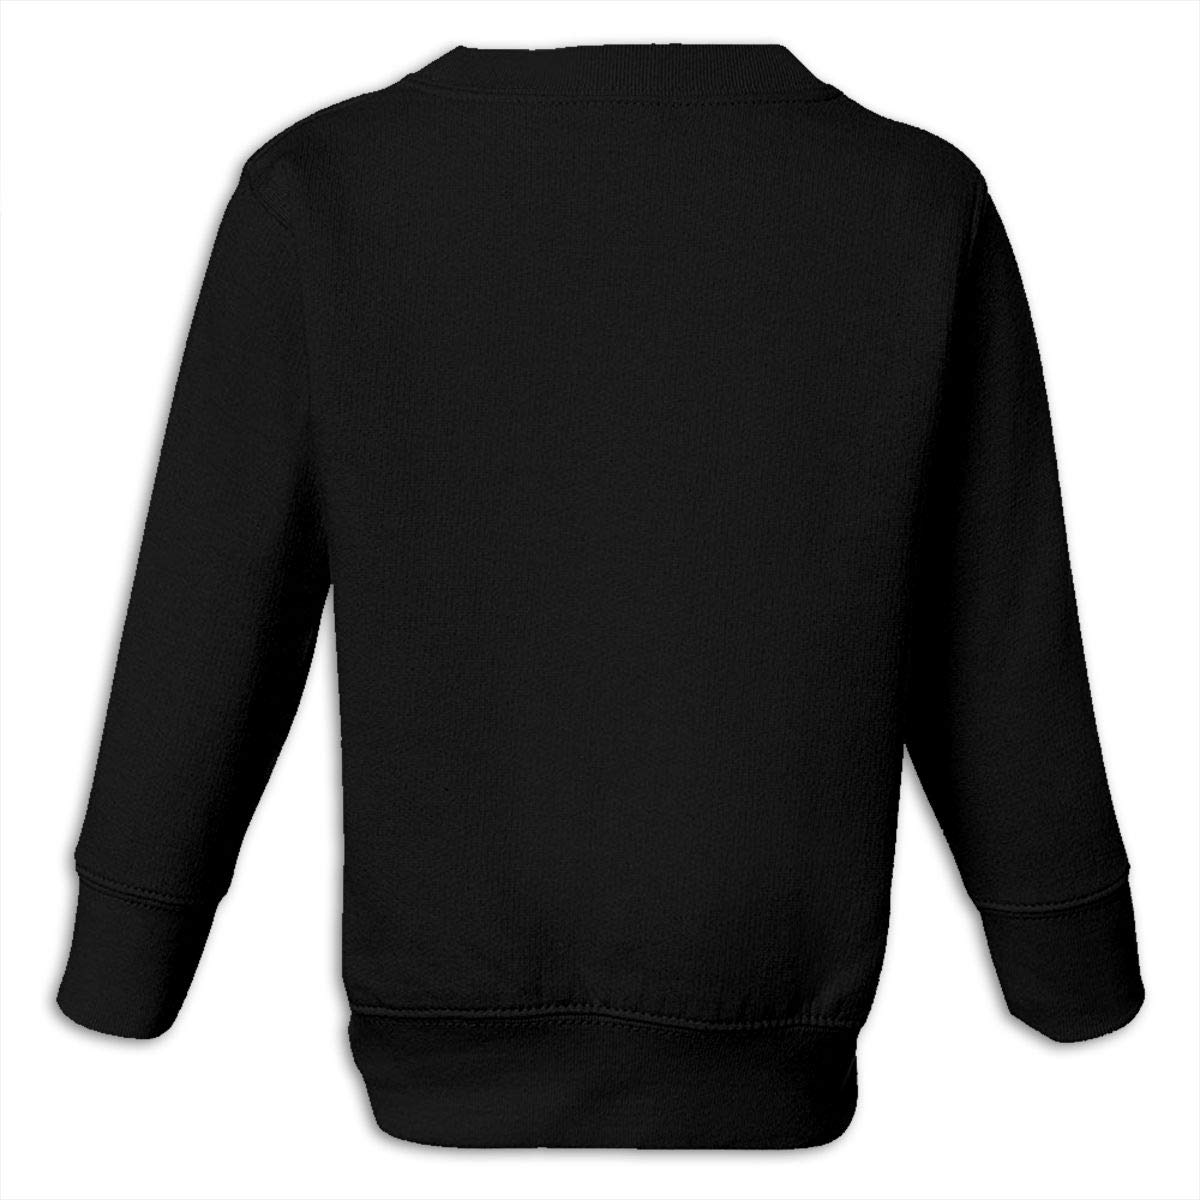 Yuliang Galactic Victory Boy Fashion Sweater Black